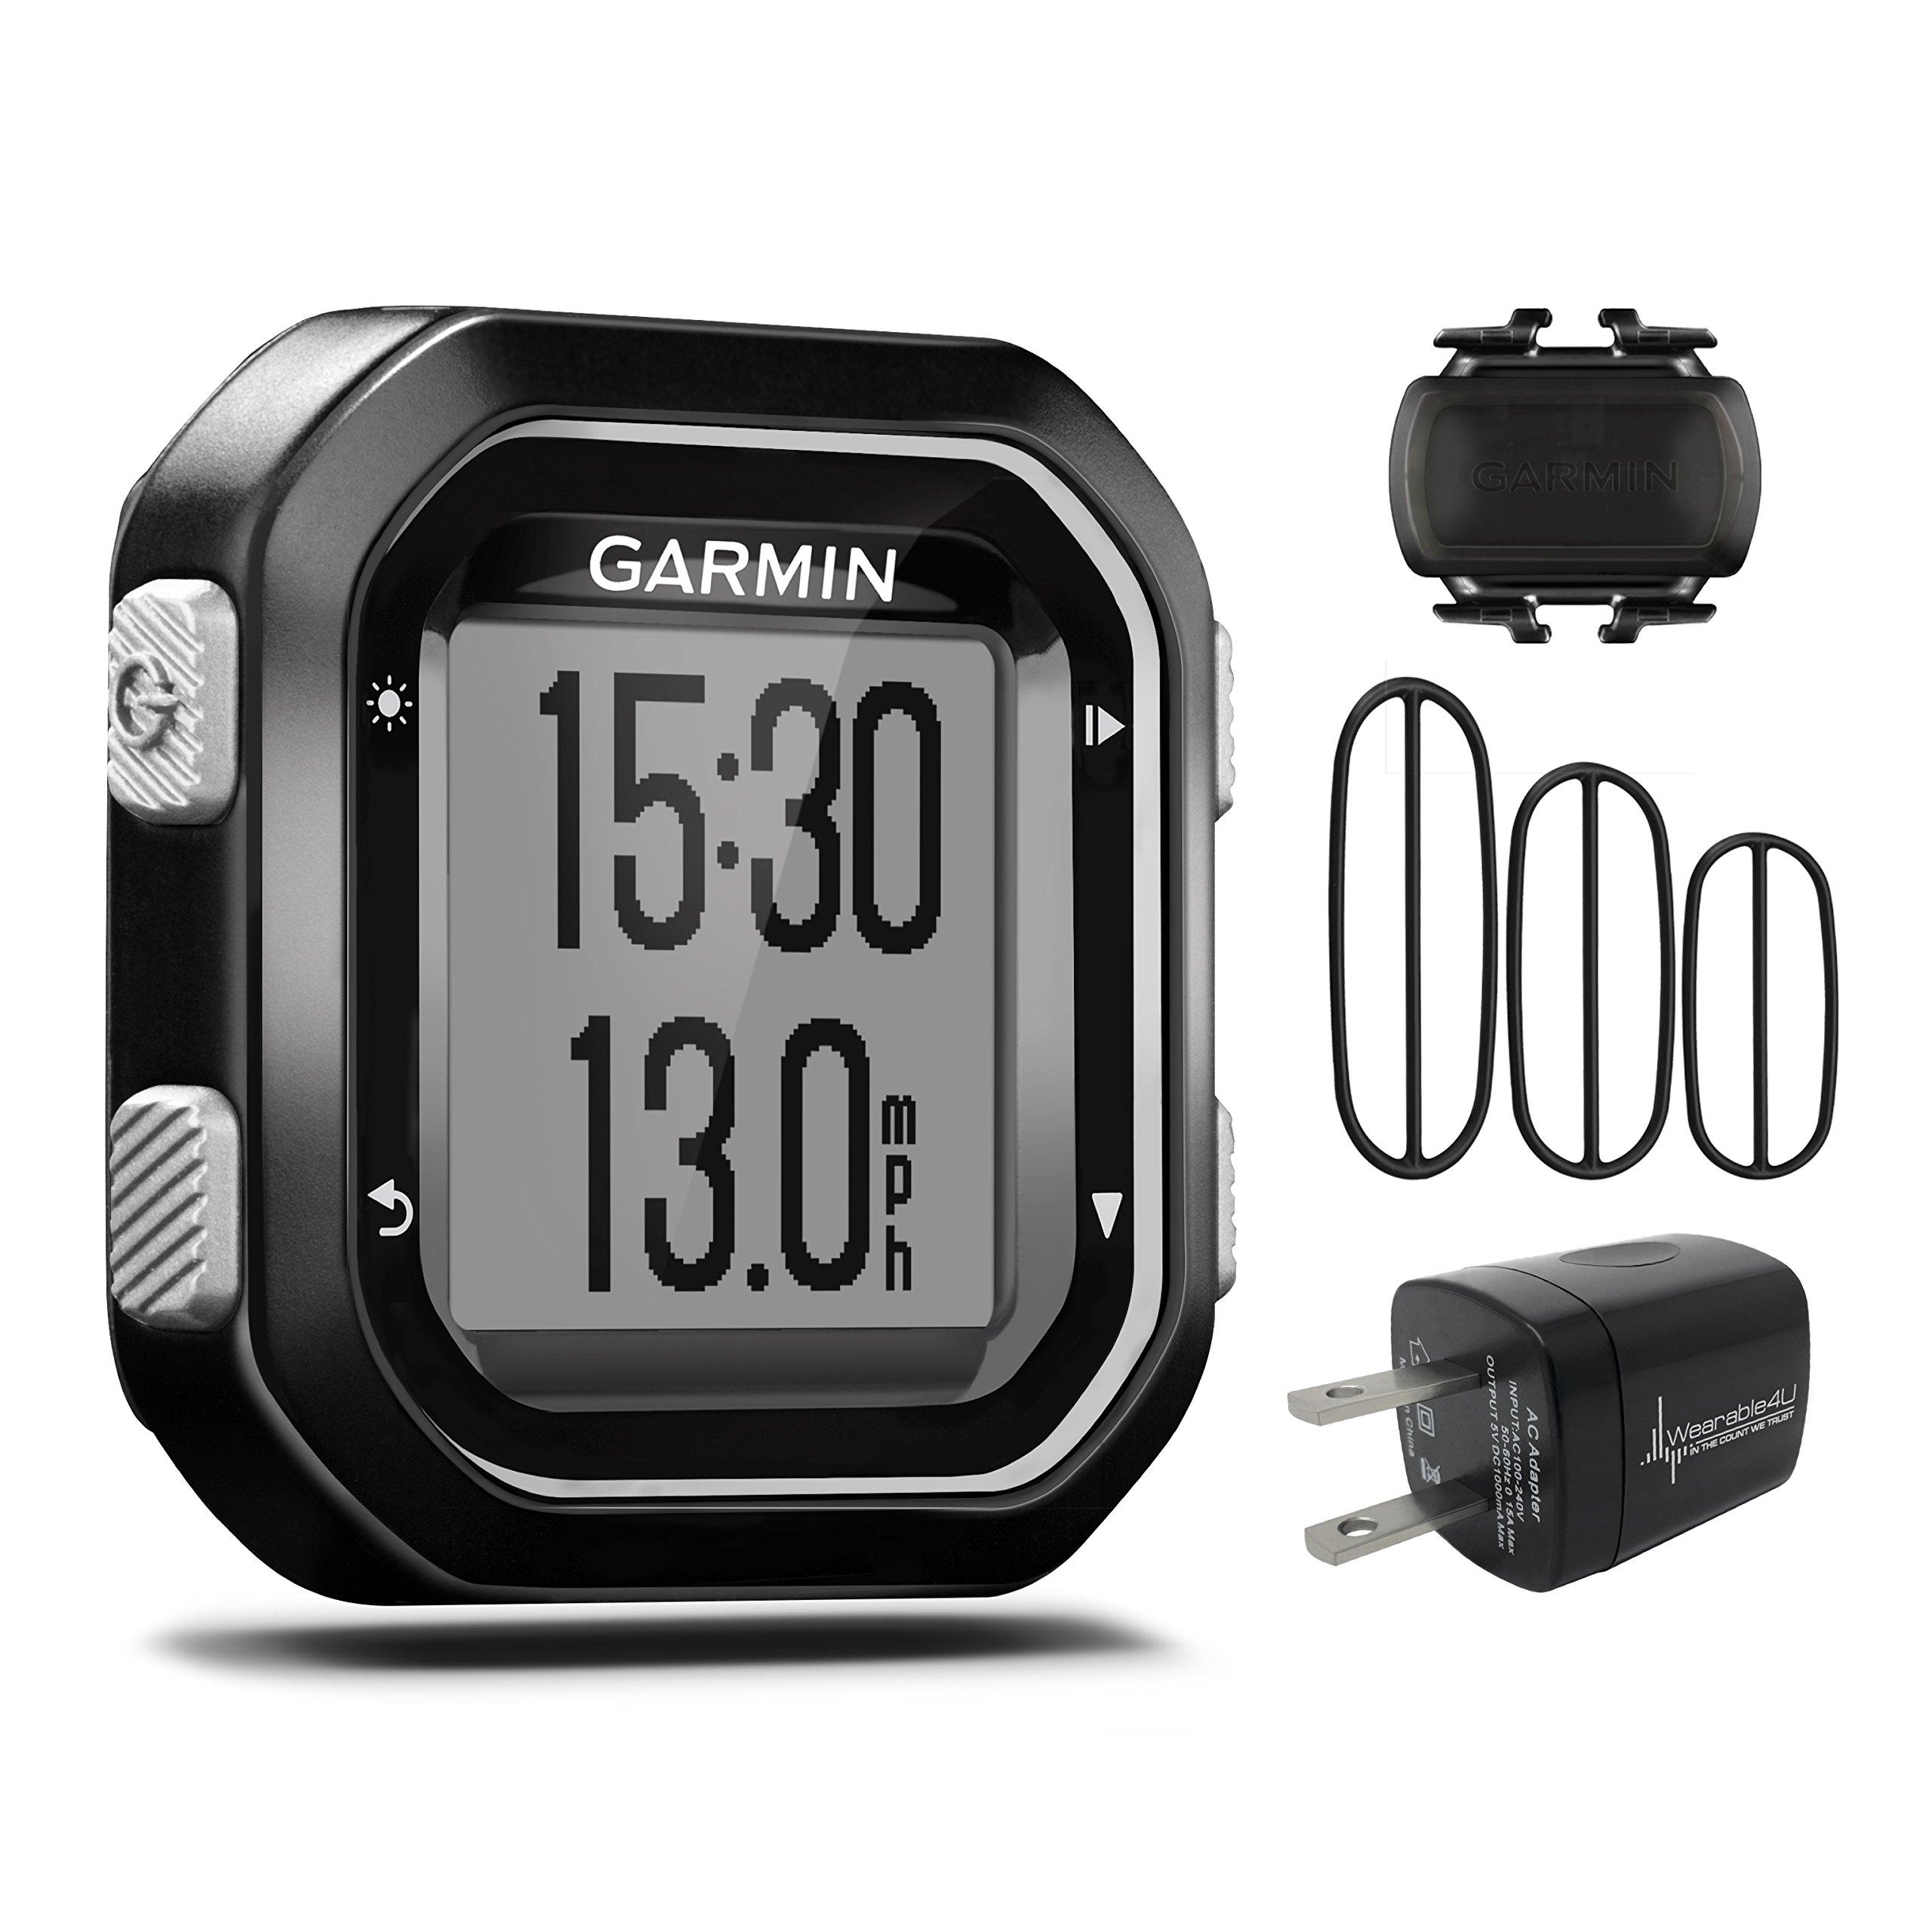 Garmin Edge 25 GPS Cycling Computer 010-03709-20 and Garmin Cadence Sensor 010-12102-00 with extra Wearable4U Wall Charging Adapter Bundle